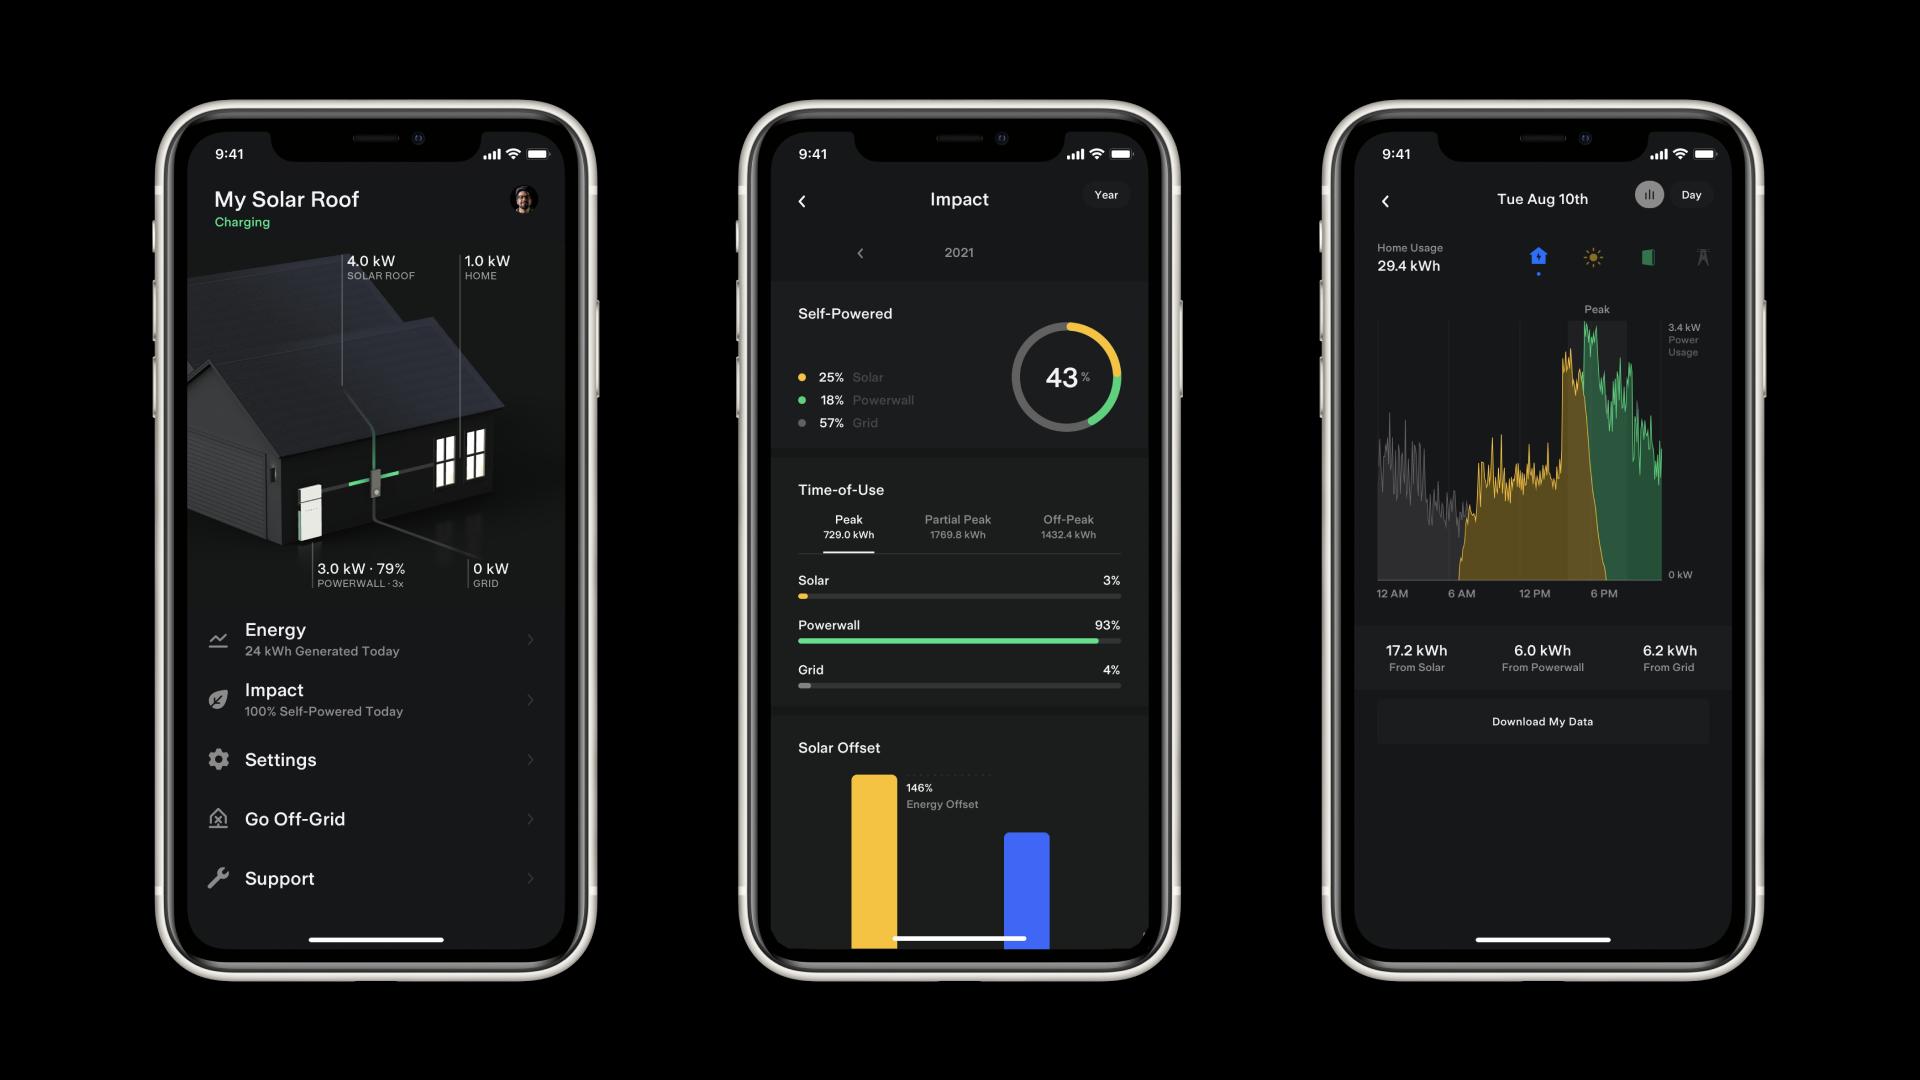 Tesla Mobile App Overview